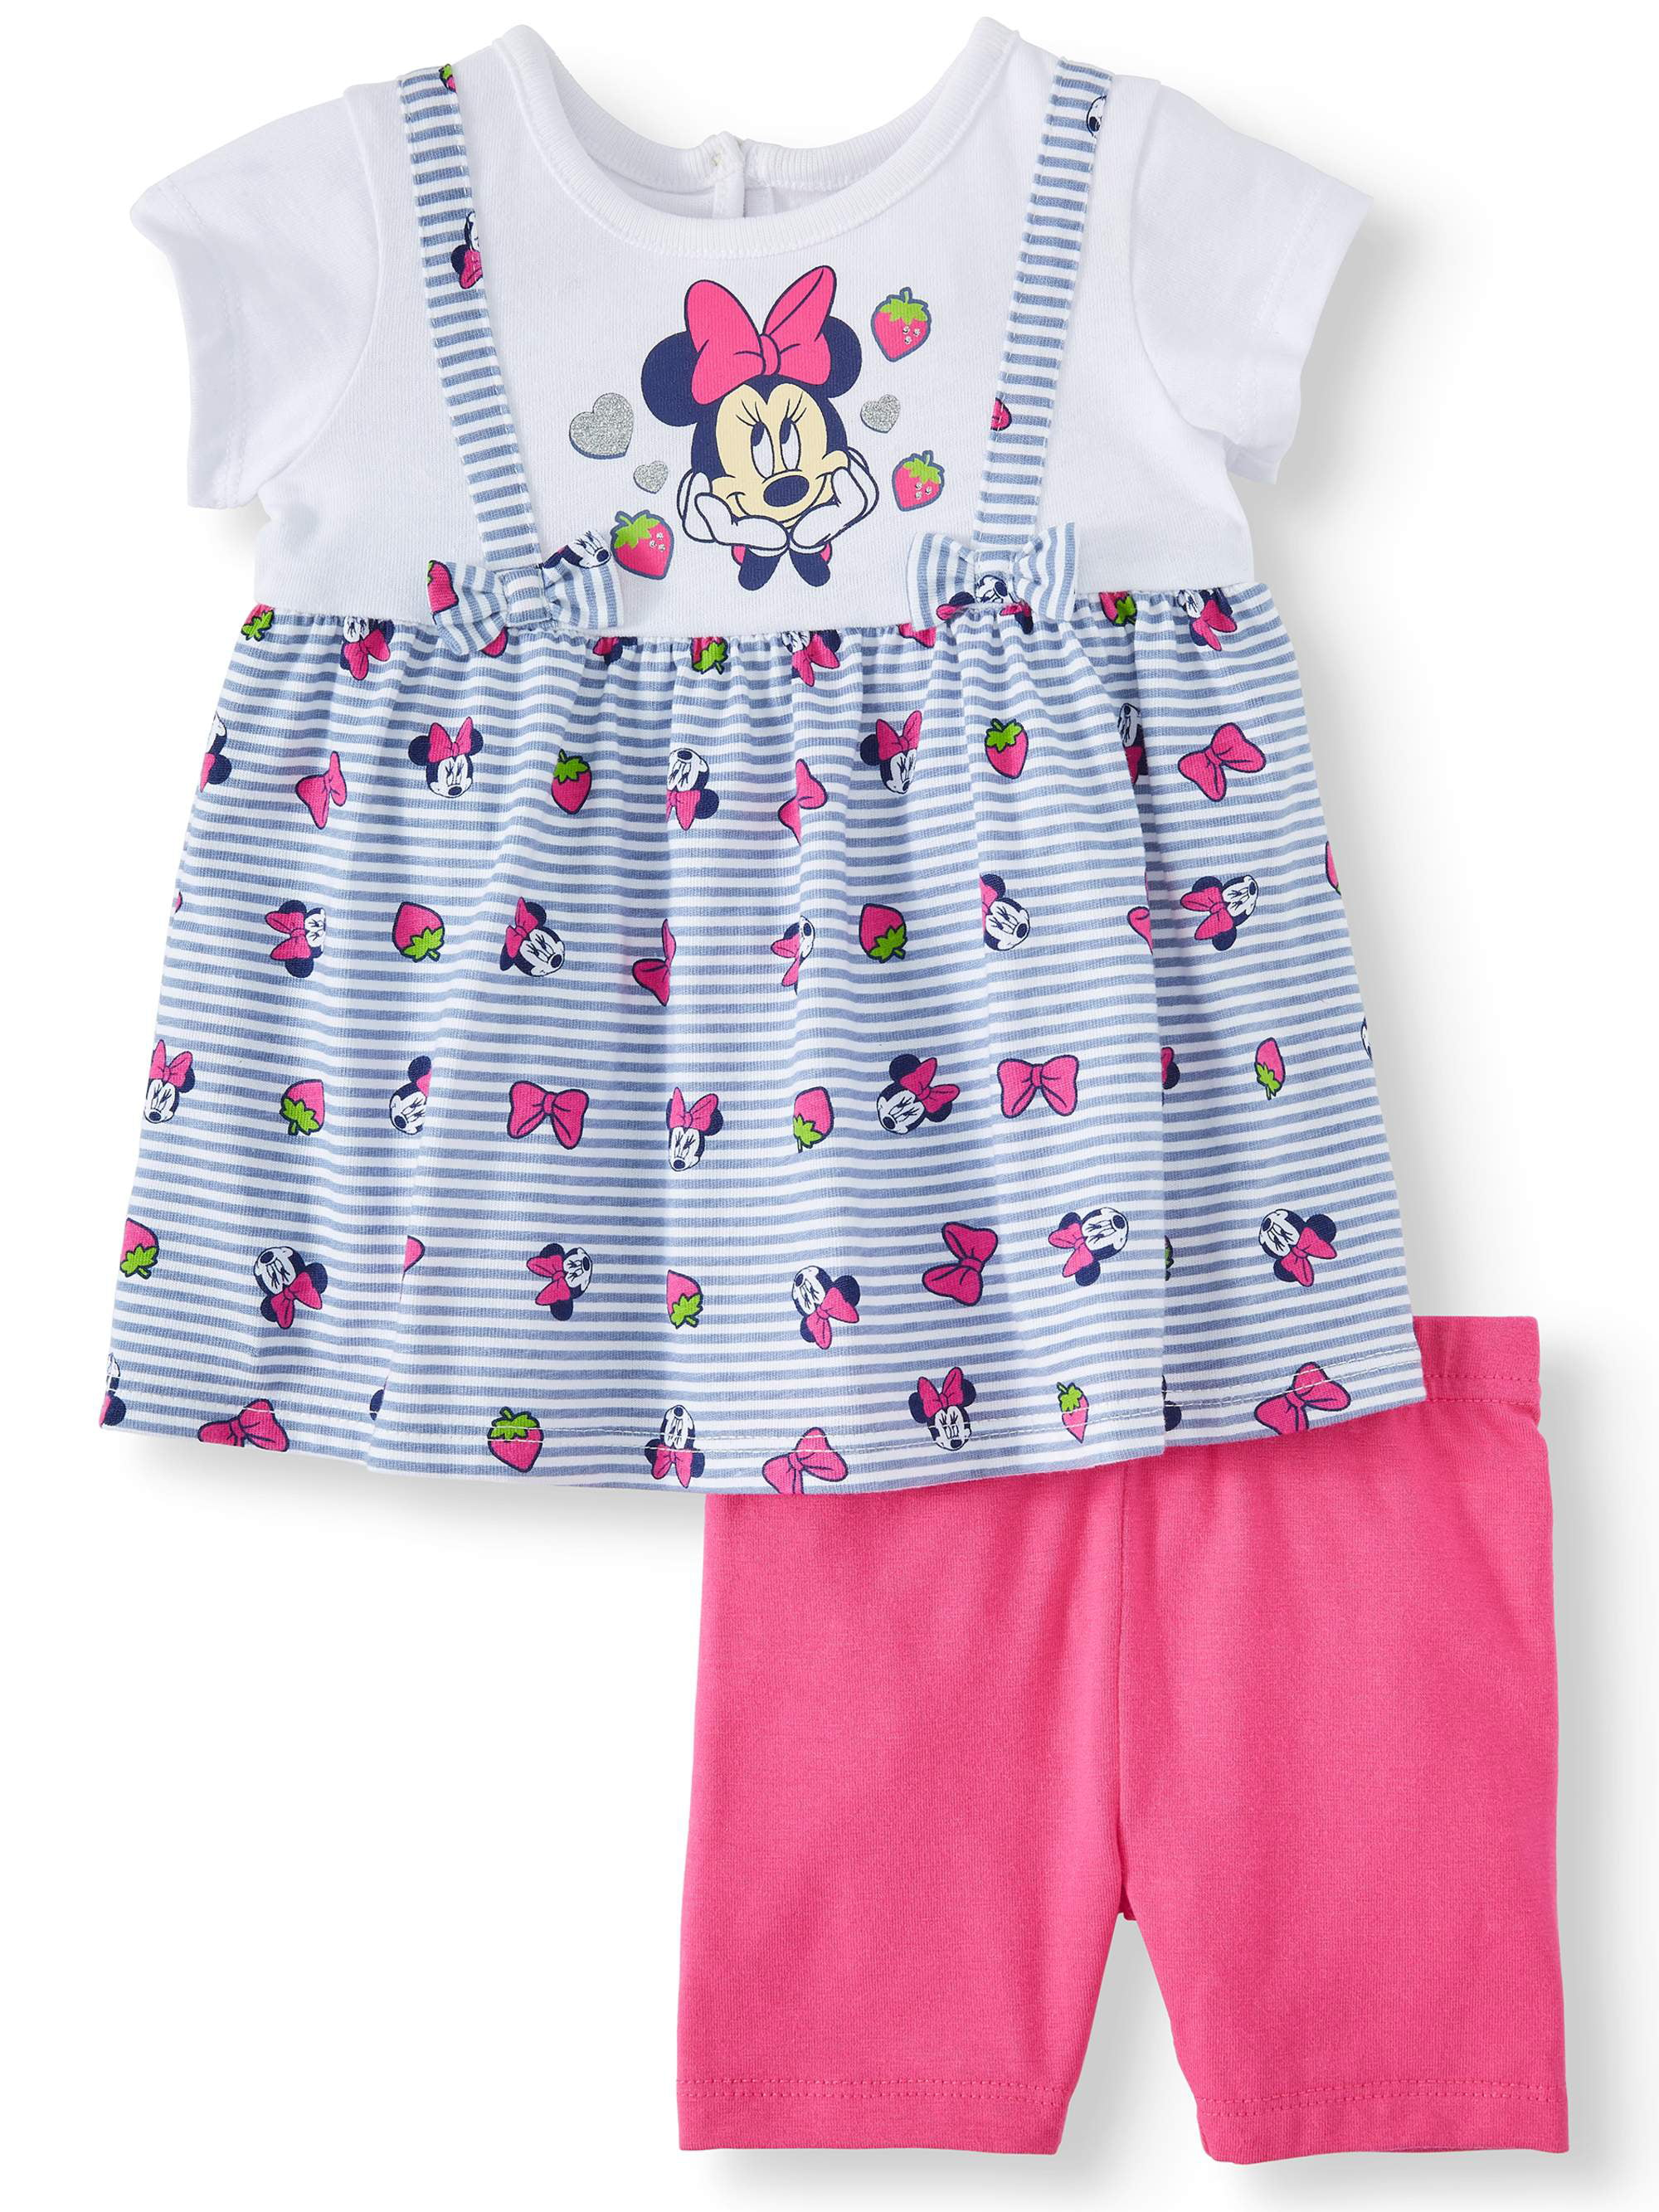 Red White Blue Bows. Disney Minnie Mouse Toddler Girls Bike Short Set